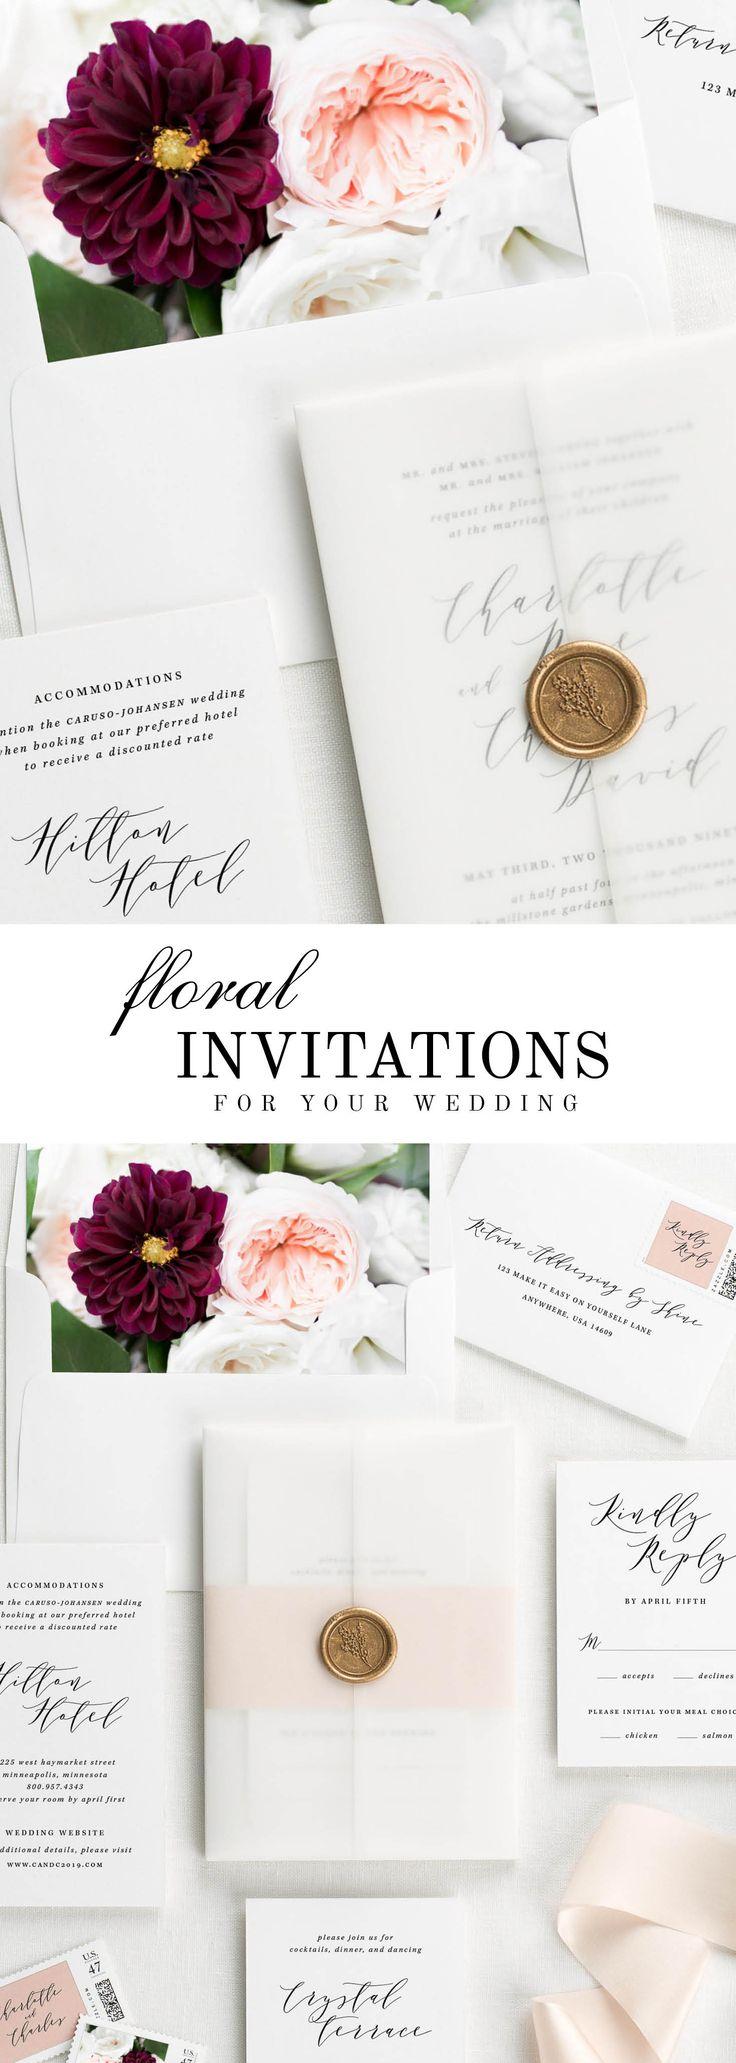 790 best Shine Wedding Invitations images on Pinterest